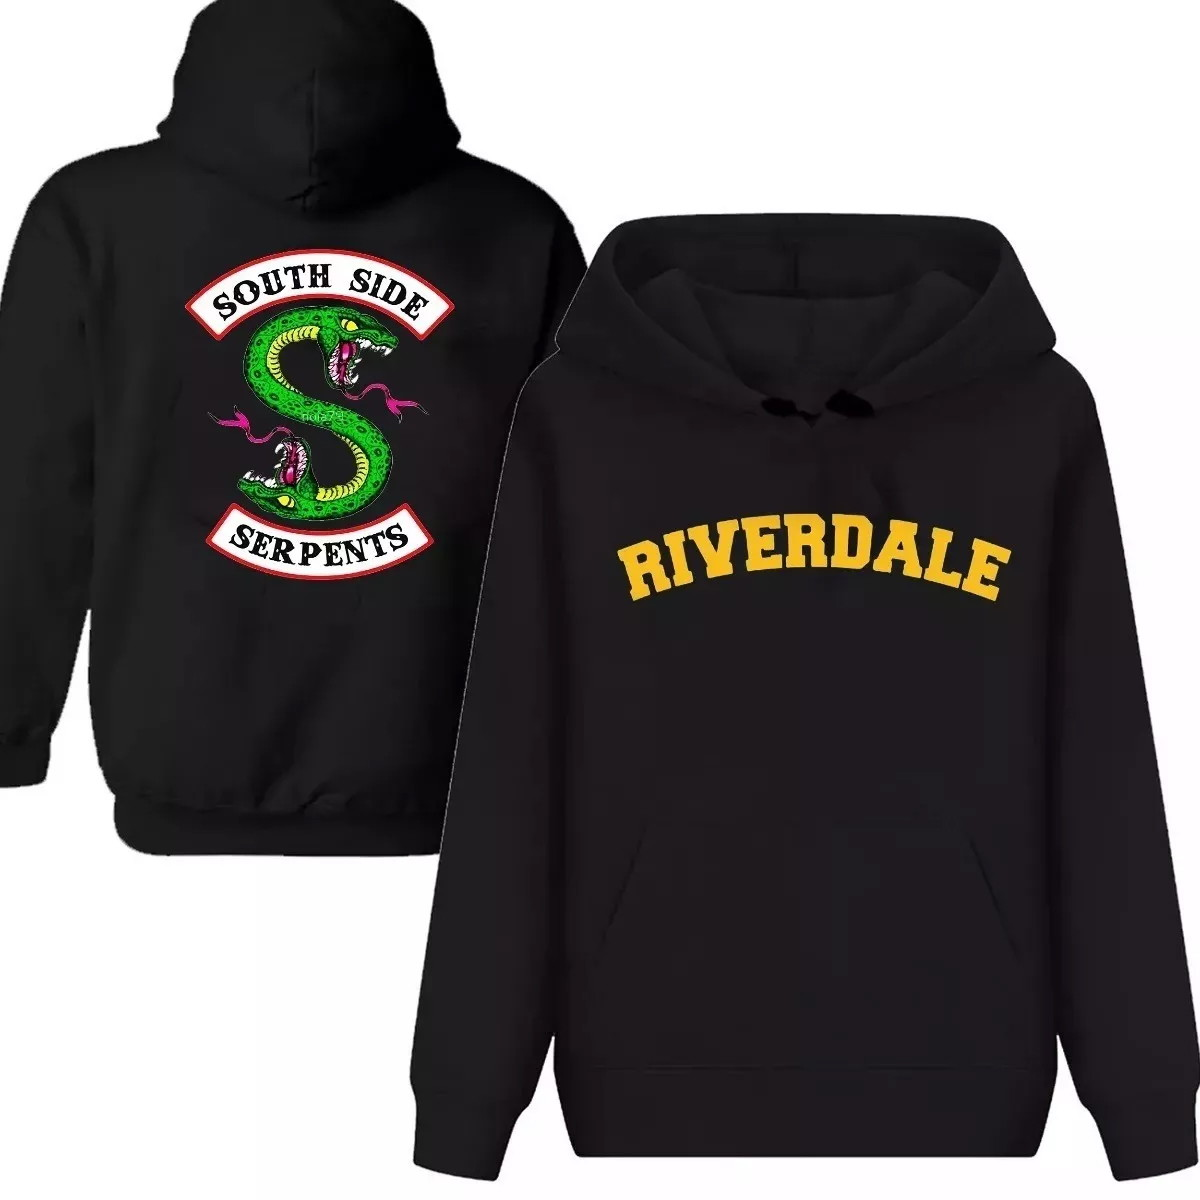 94e3cc37b Blusa Moletom Riverdale Netflix Serie Bulldogs Serpentes no Elo7 ...